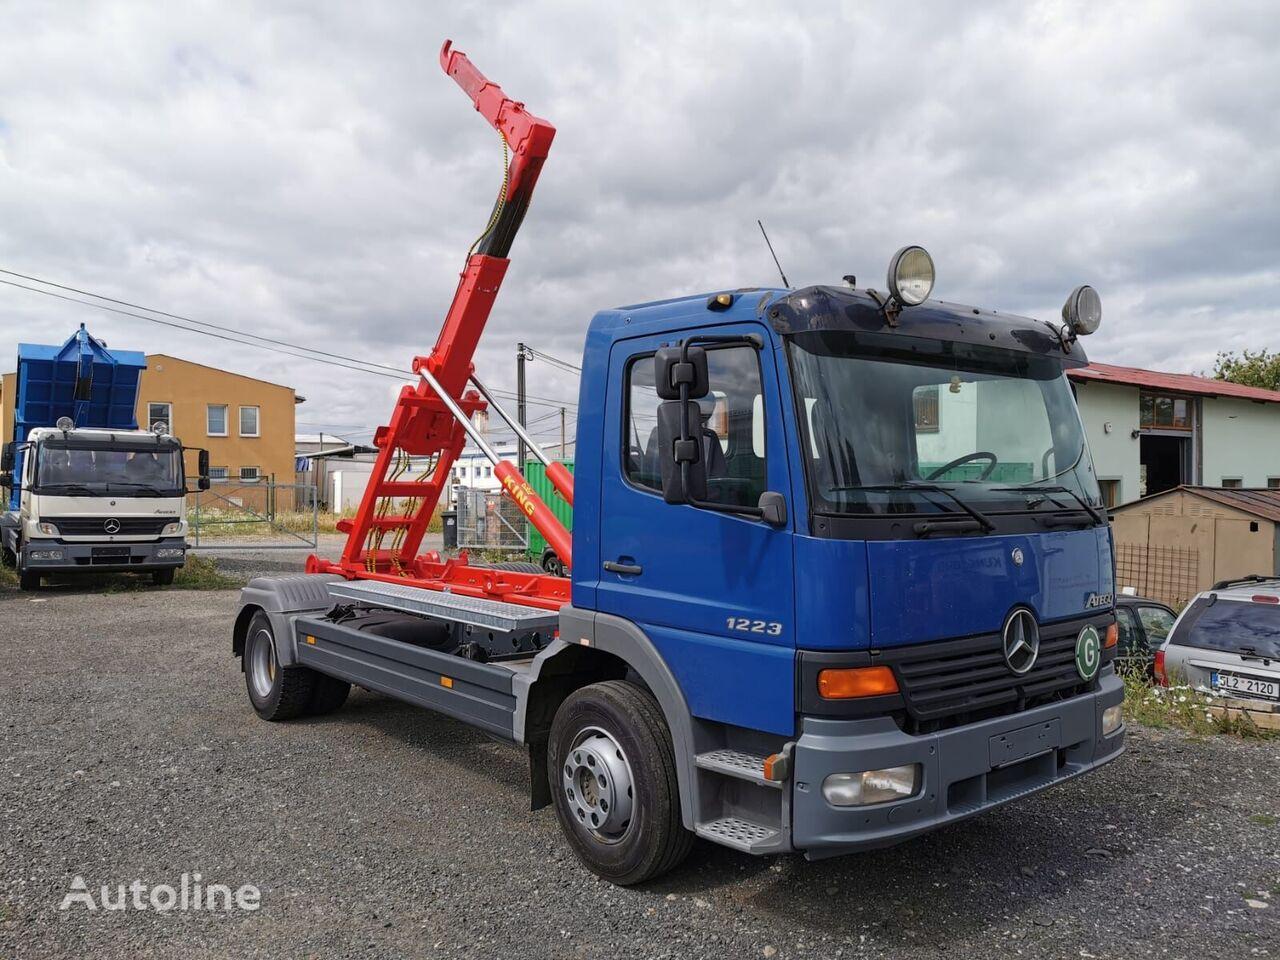 MERCEDES-BENZ Atego 1223 nowy hakowiec KING HZ10 camión con gancho